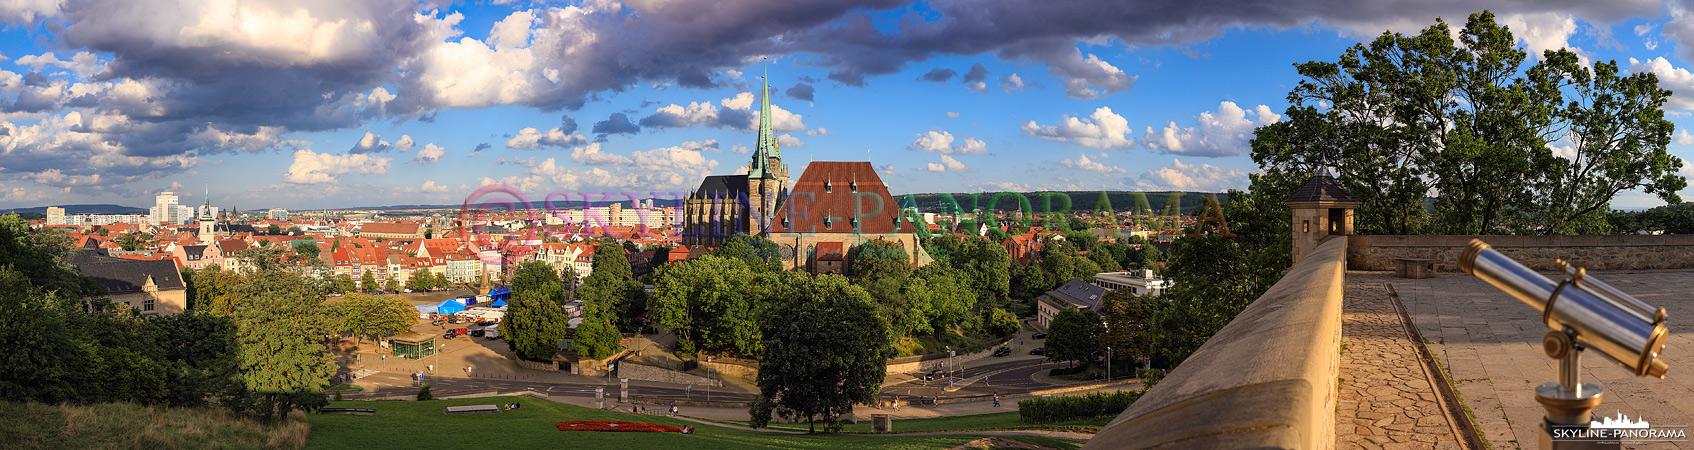 Stadtansicht Erfurt am Tag